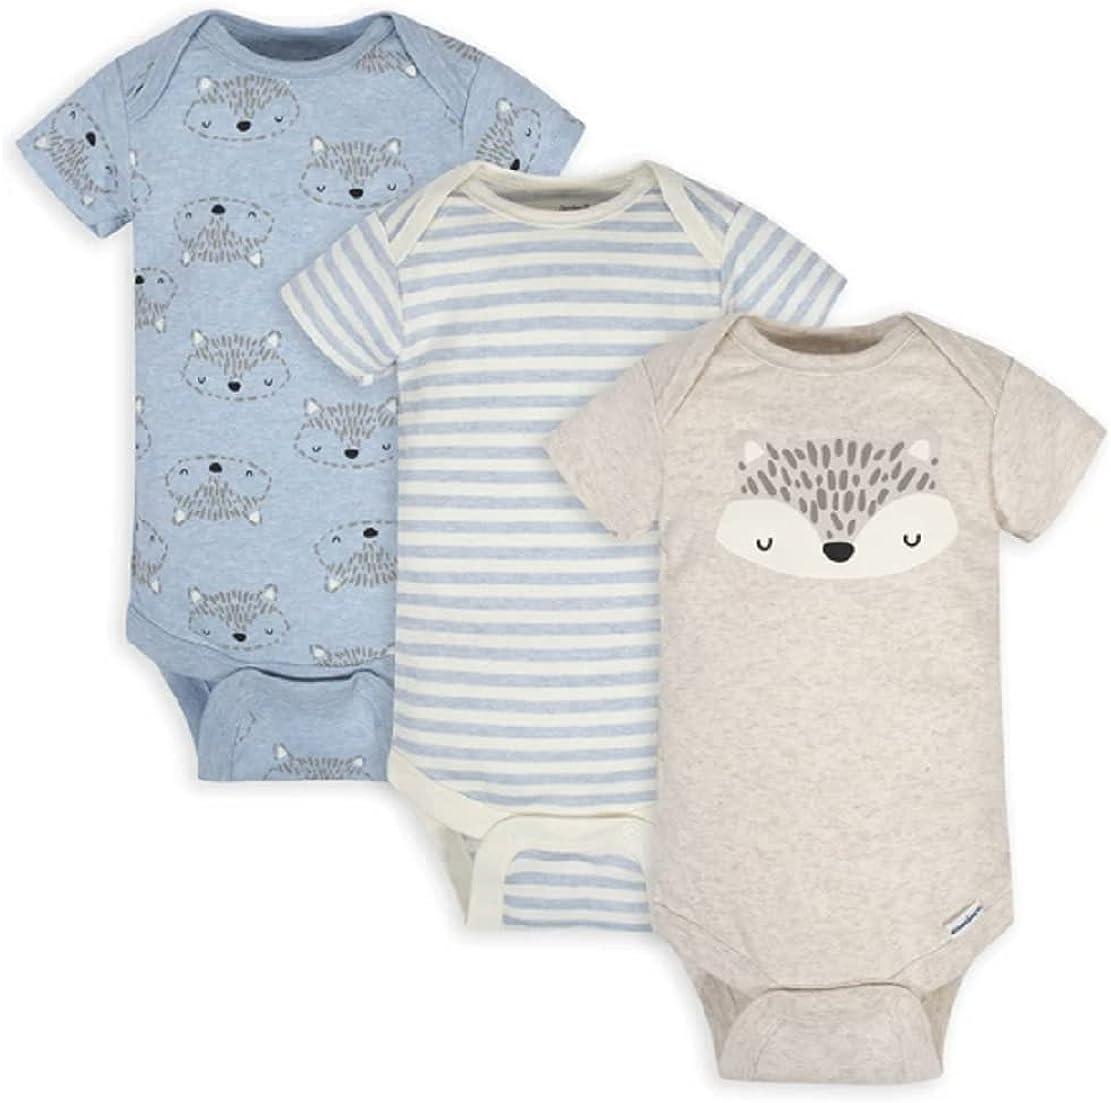 Gerber Baby Boys Organic Short Choice He Super-cheap Sleeve Bodysuit Brand Onesies